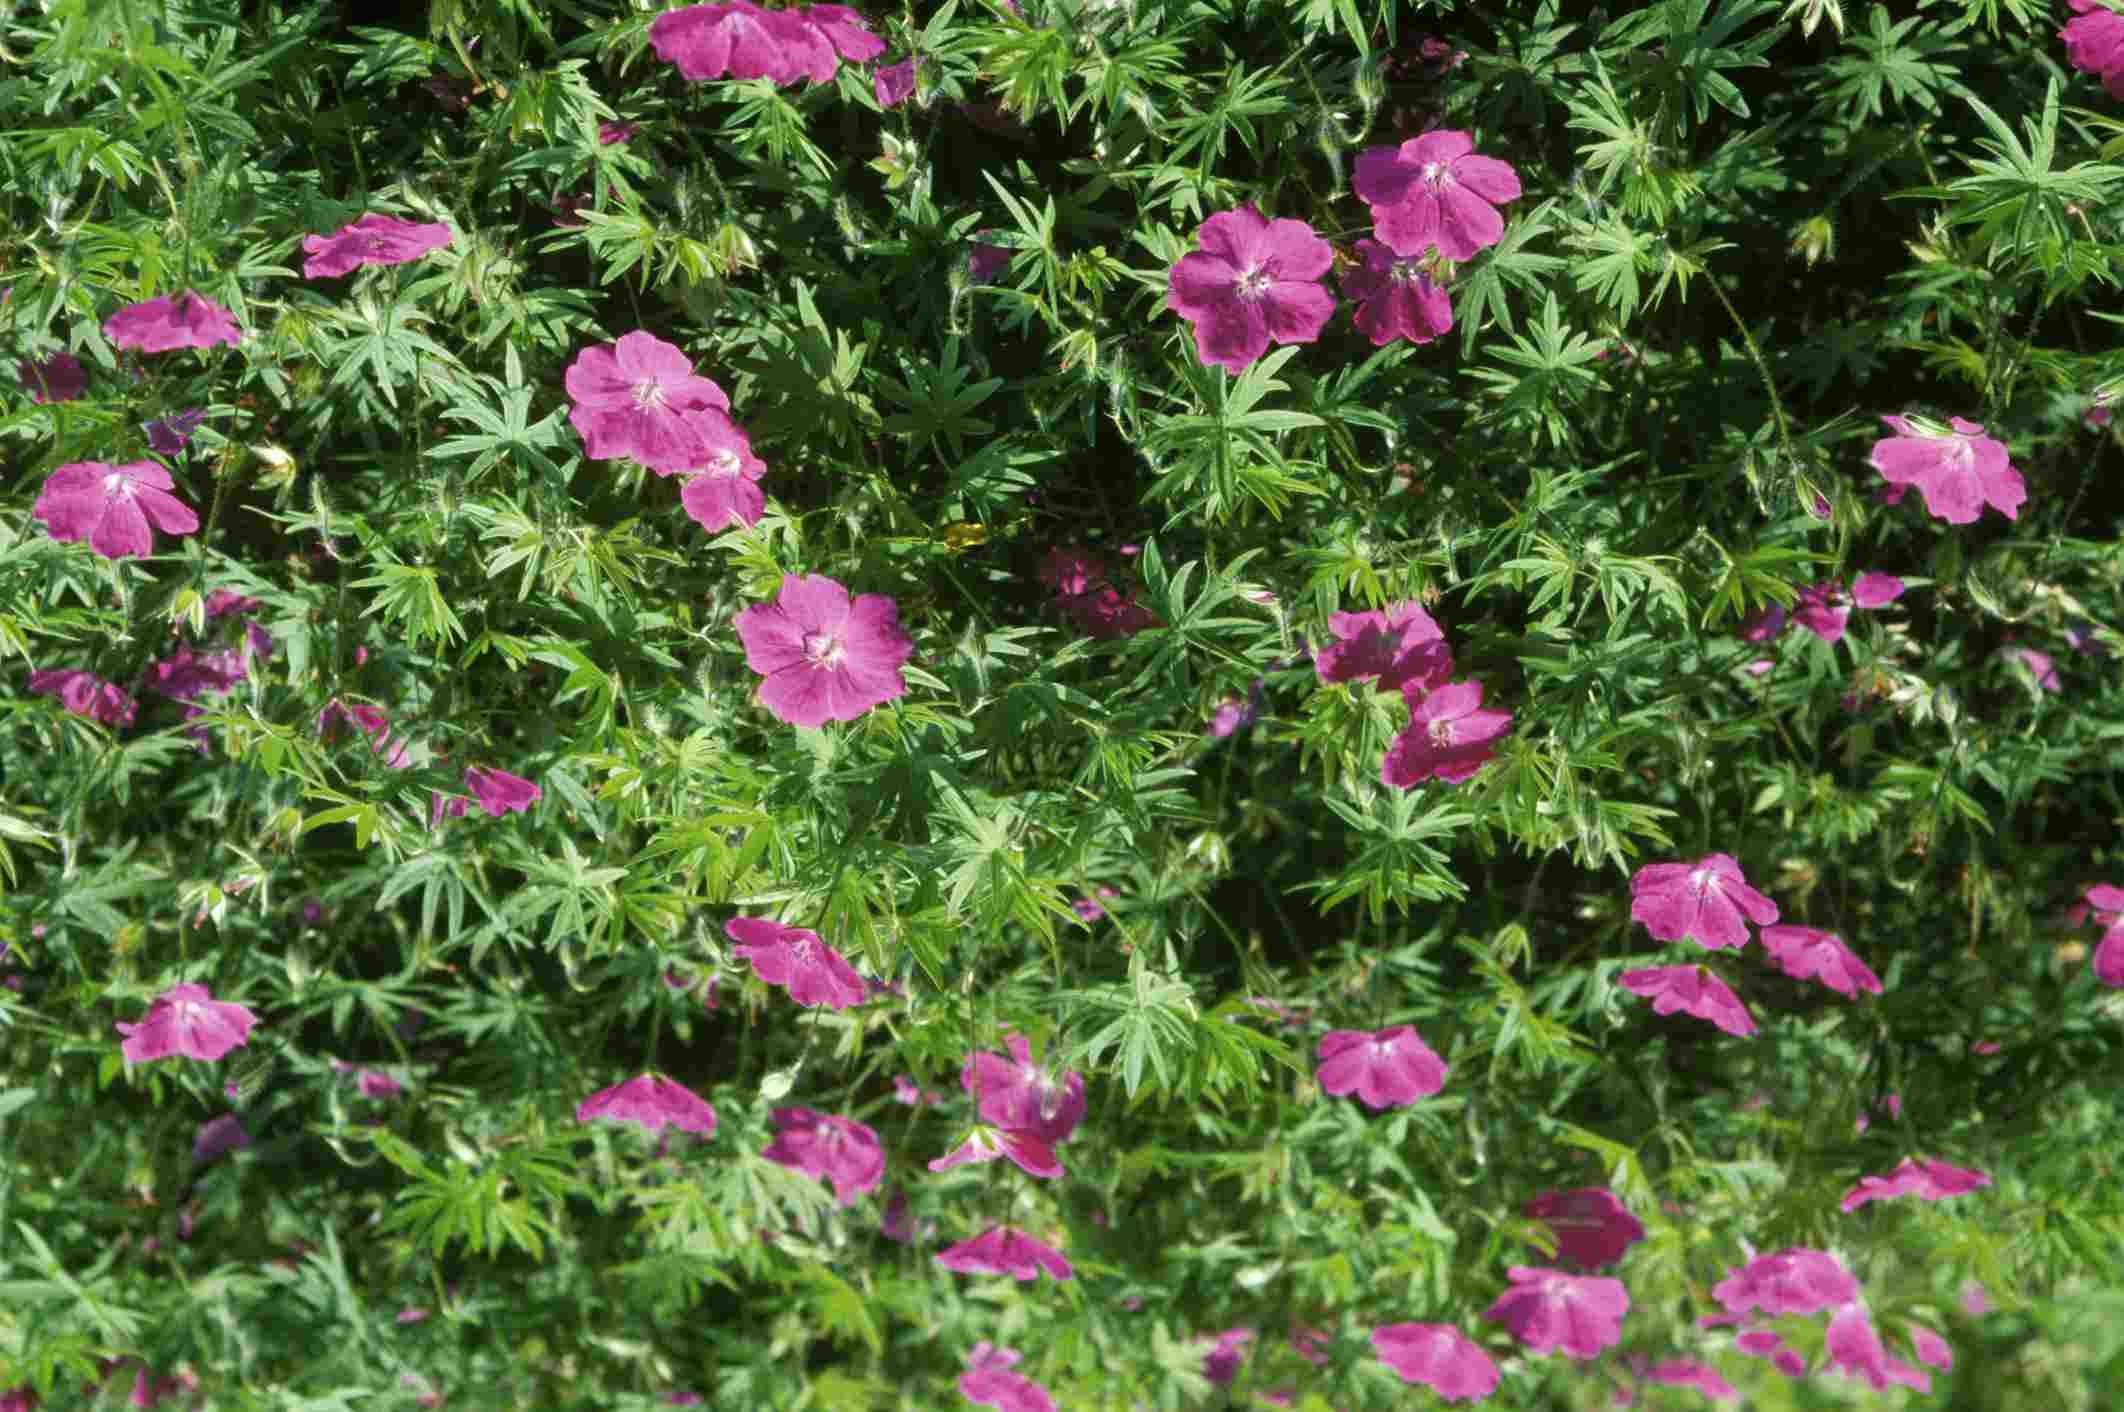 'Elsbeth' geraniums with magenta flowers